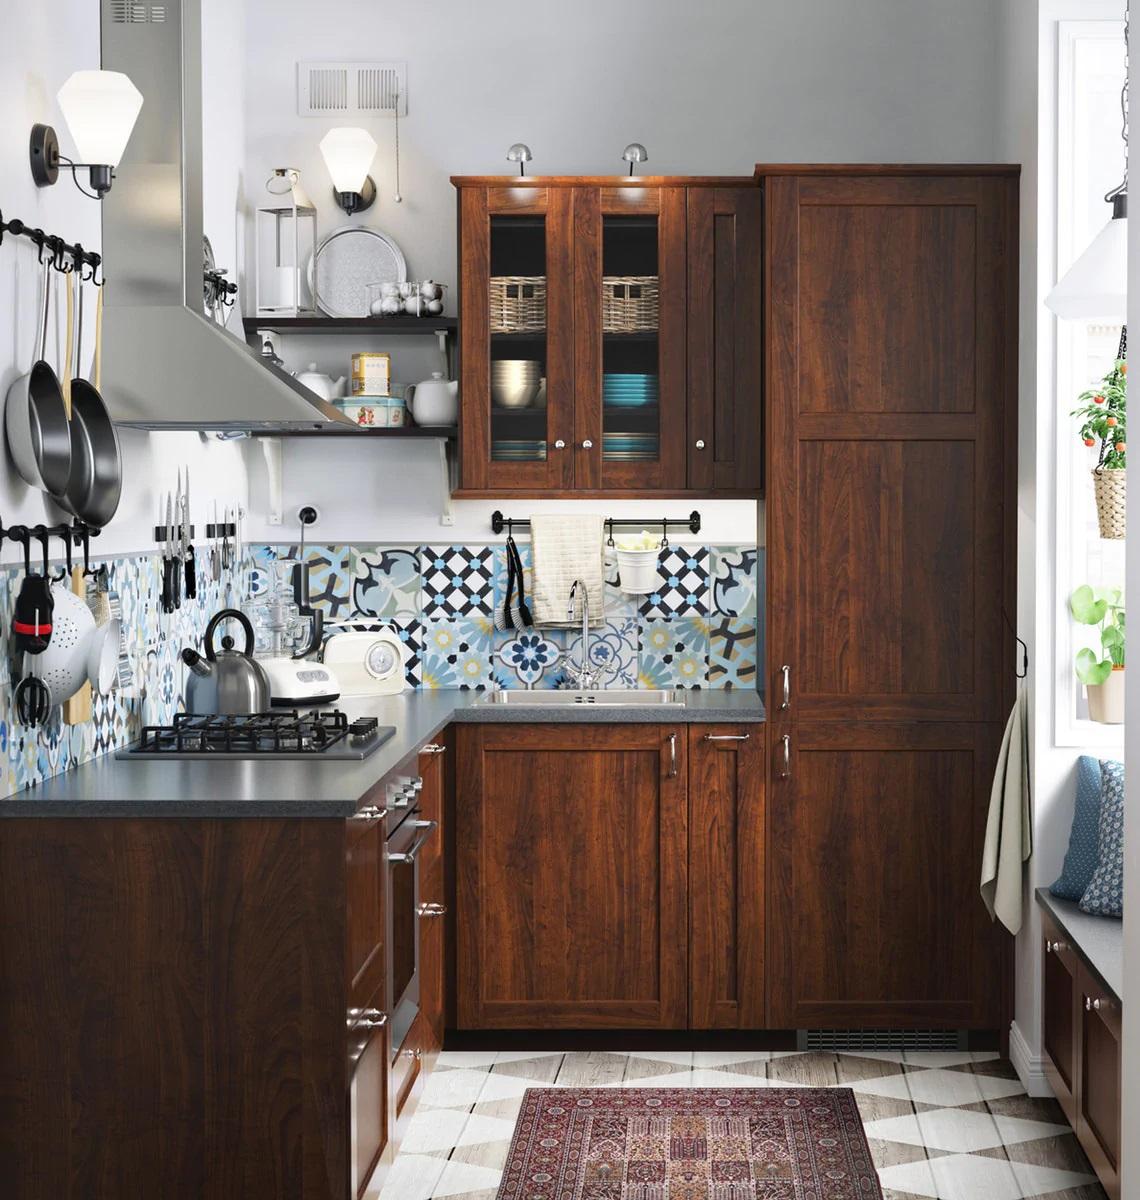 nuovo-catalogo-cucine-ikea-2020-12